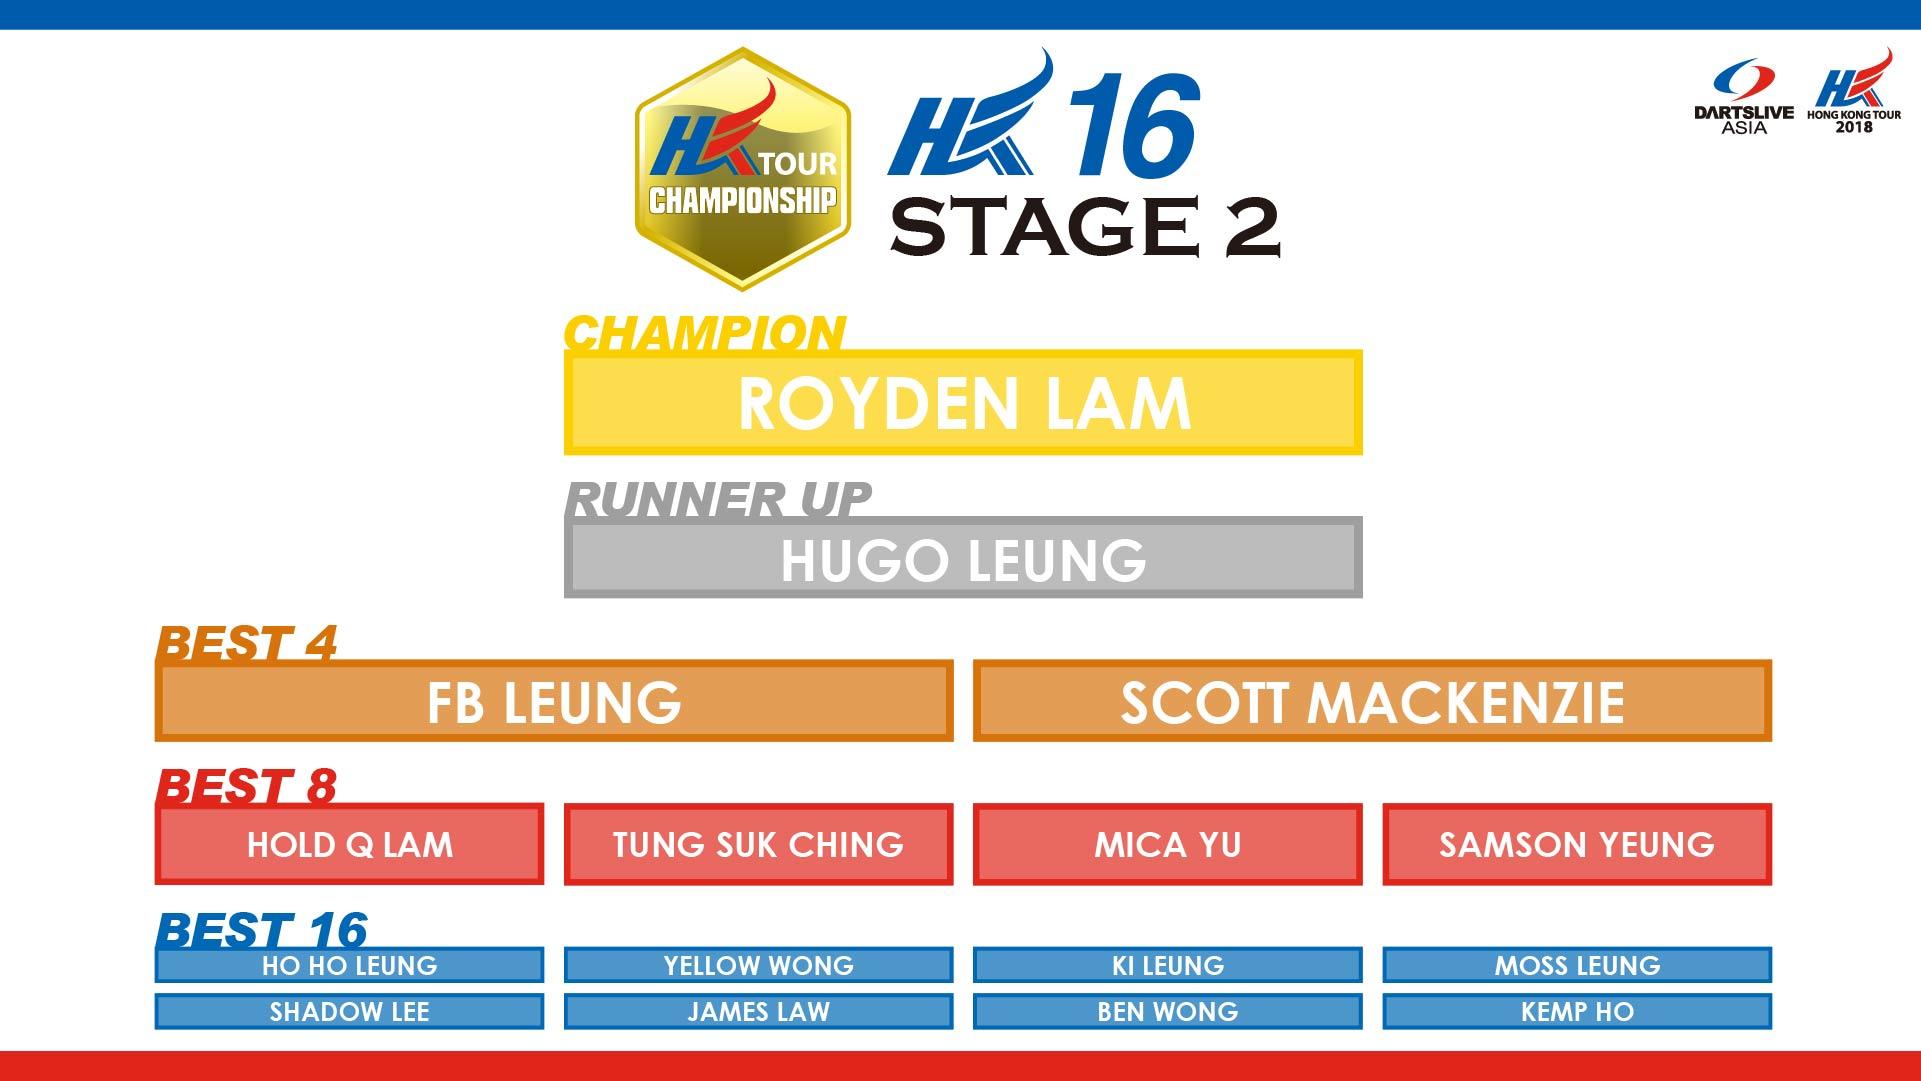 HKTCS 2018 STAGE 2 hk16 RESULT